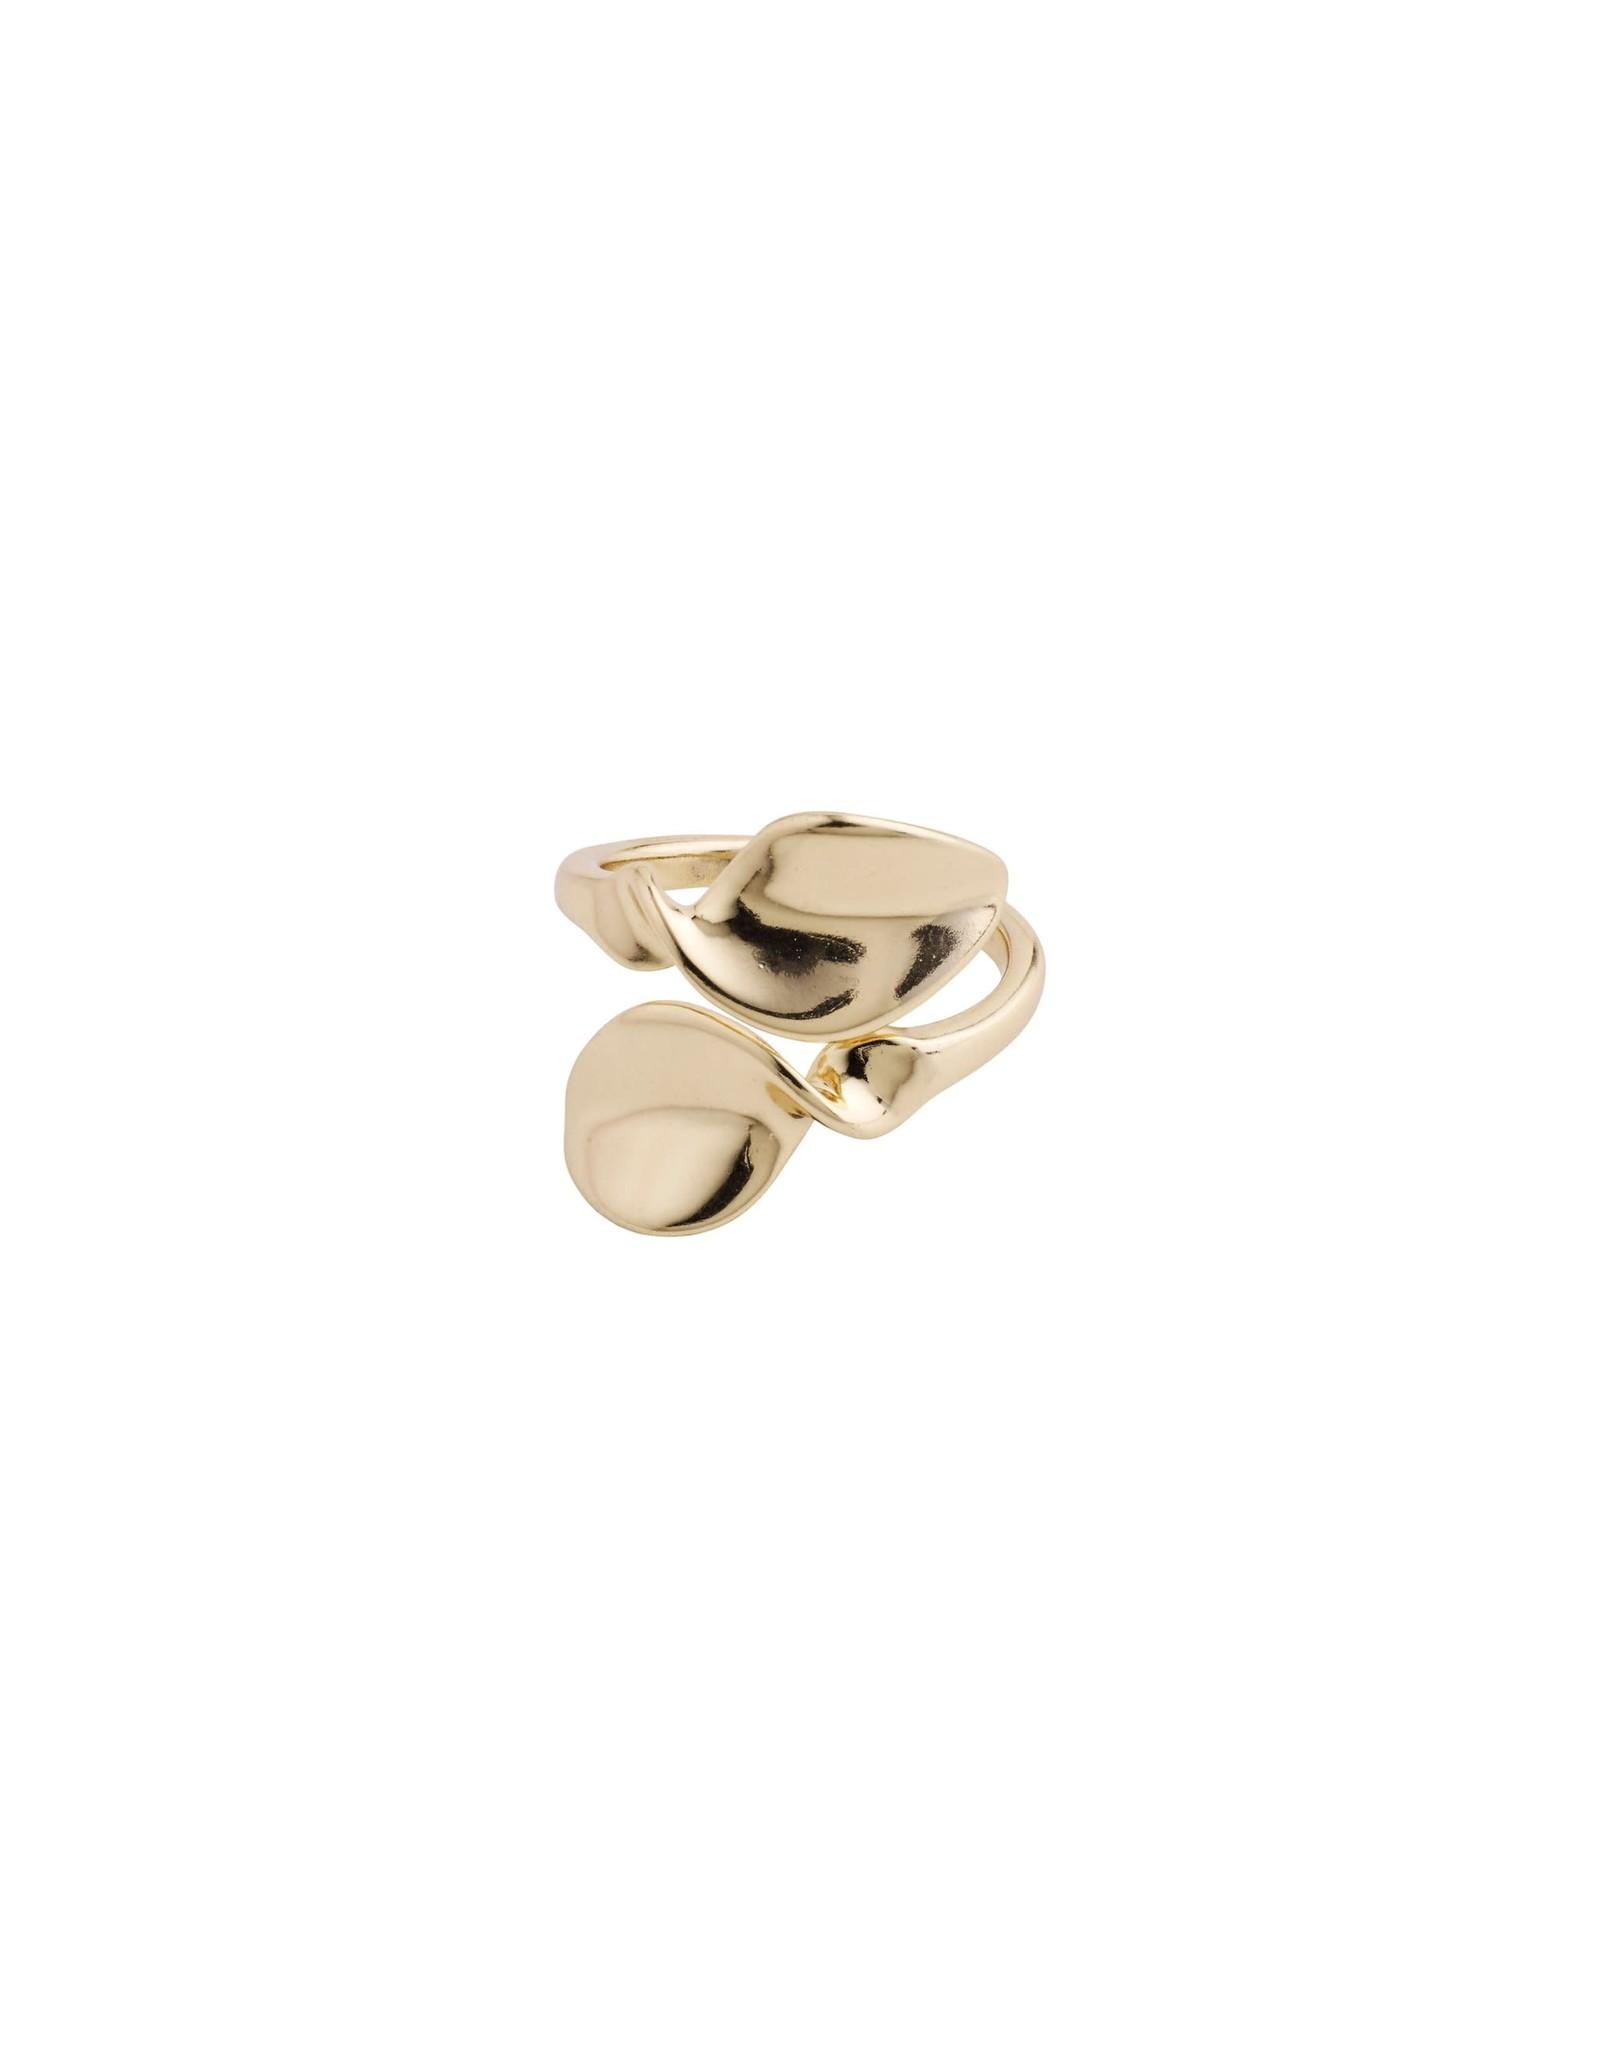 Pilgrim Pilgrim Hollis Ring Gold Plated